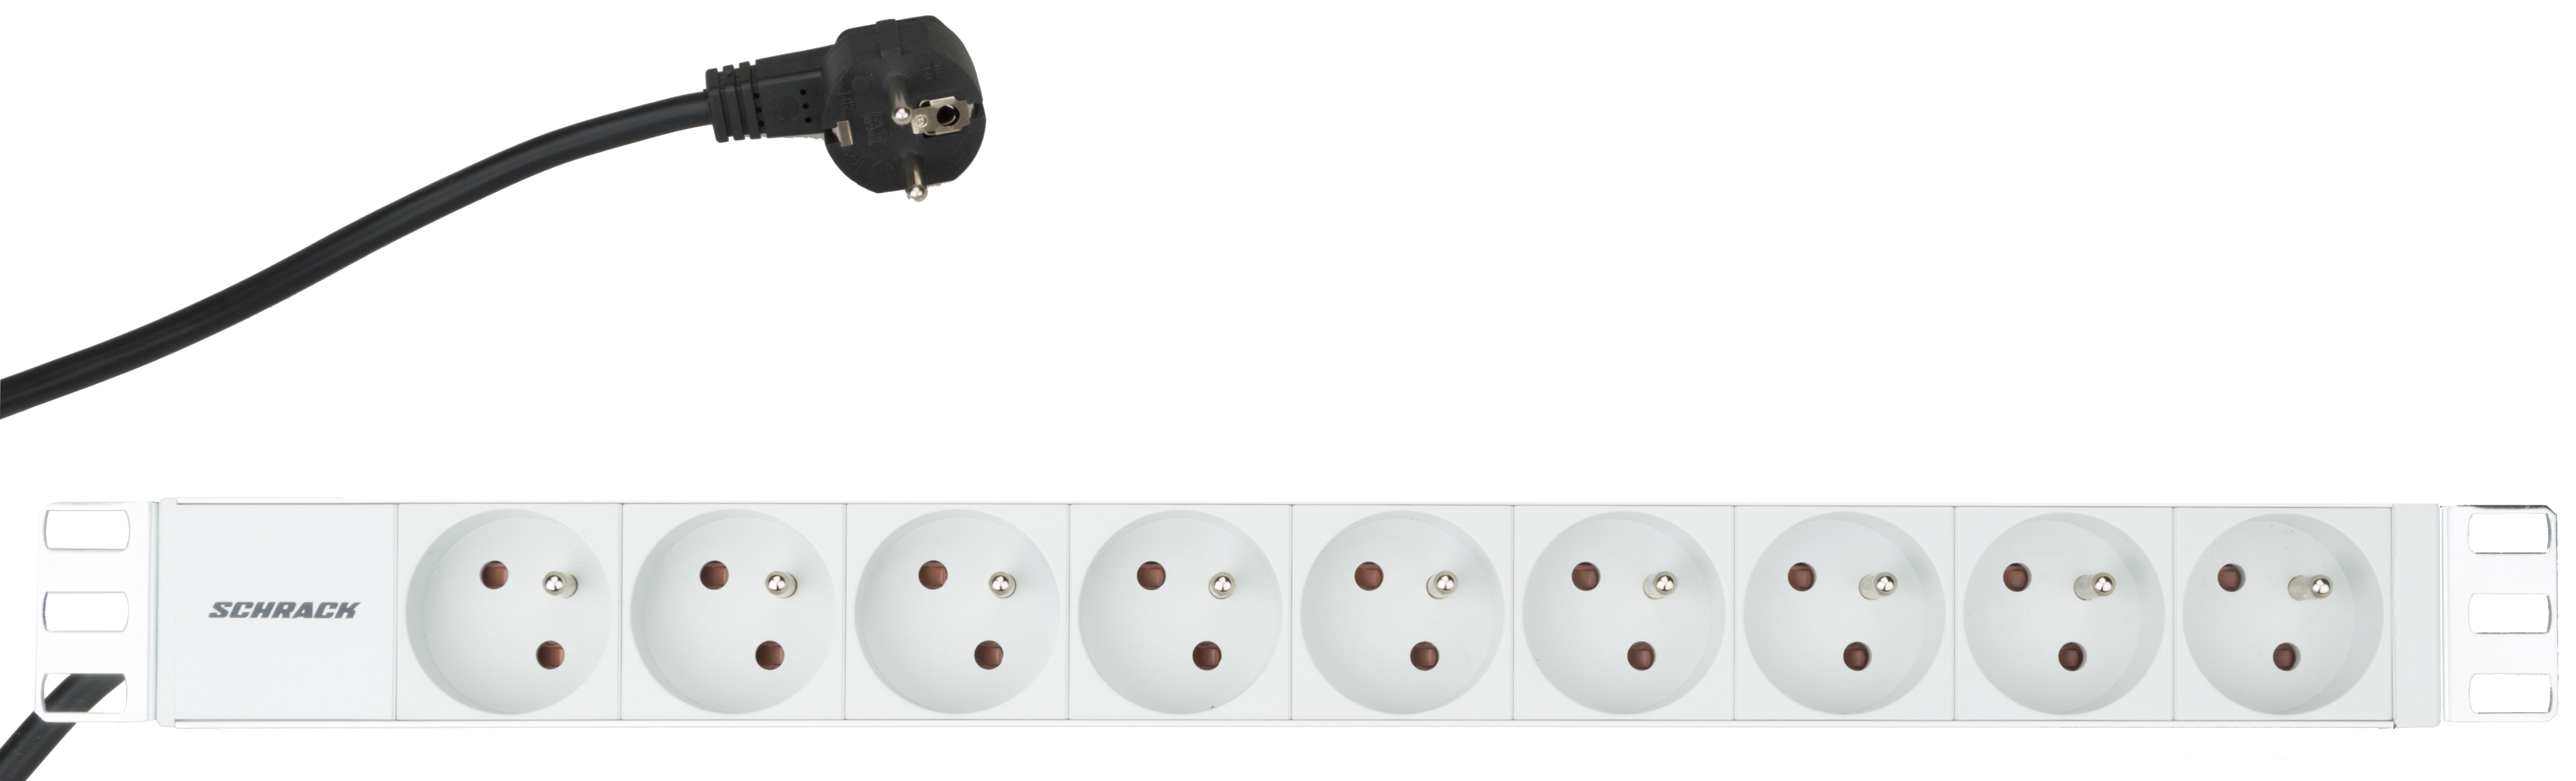 1 Stk 19 Netzleiste 9xUTE, Profil ALU 1HE, 2m-Kabel, RAL7035 IU070110--